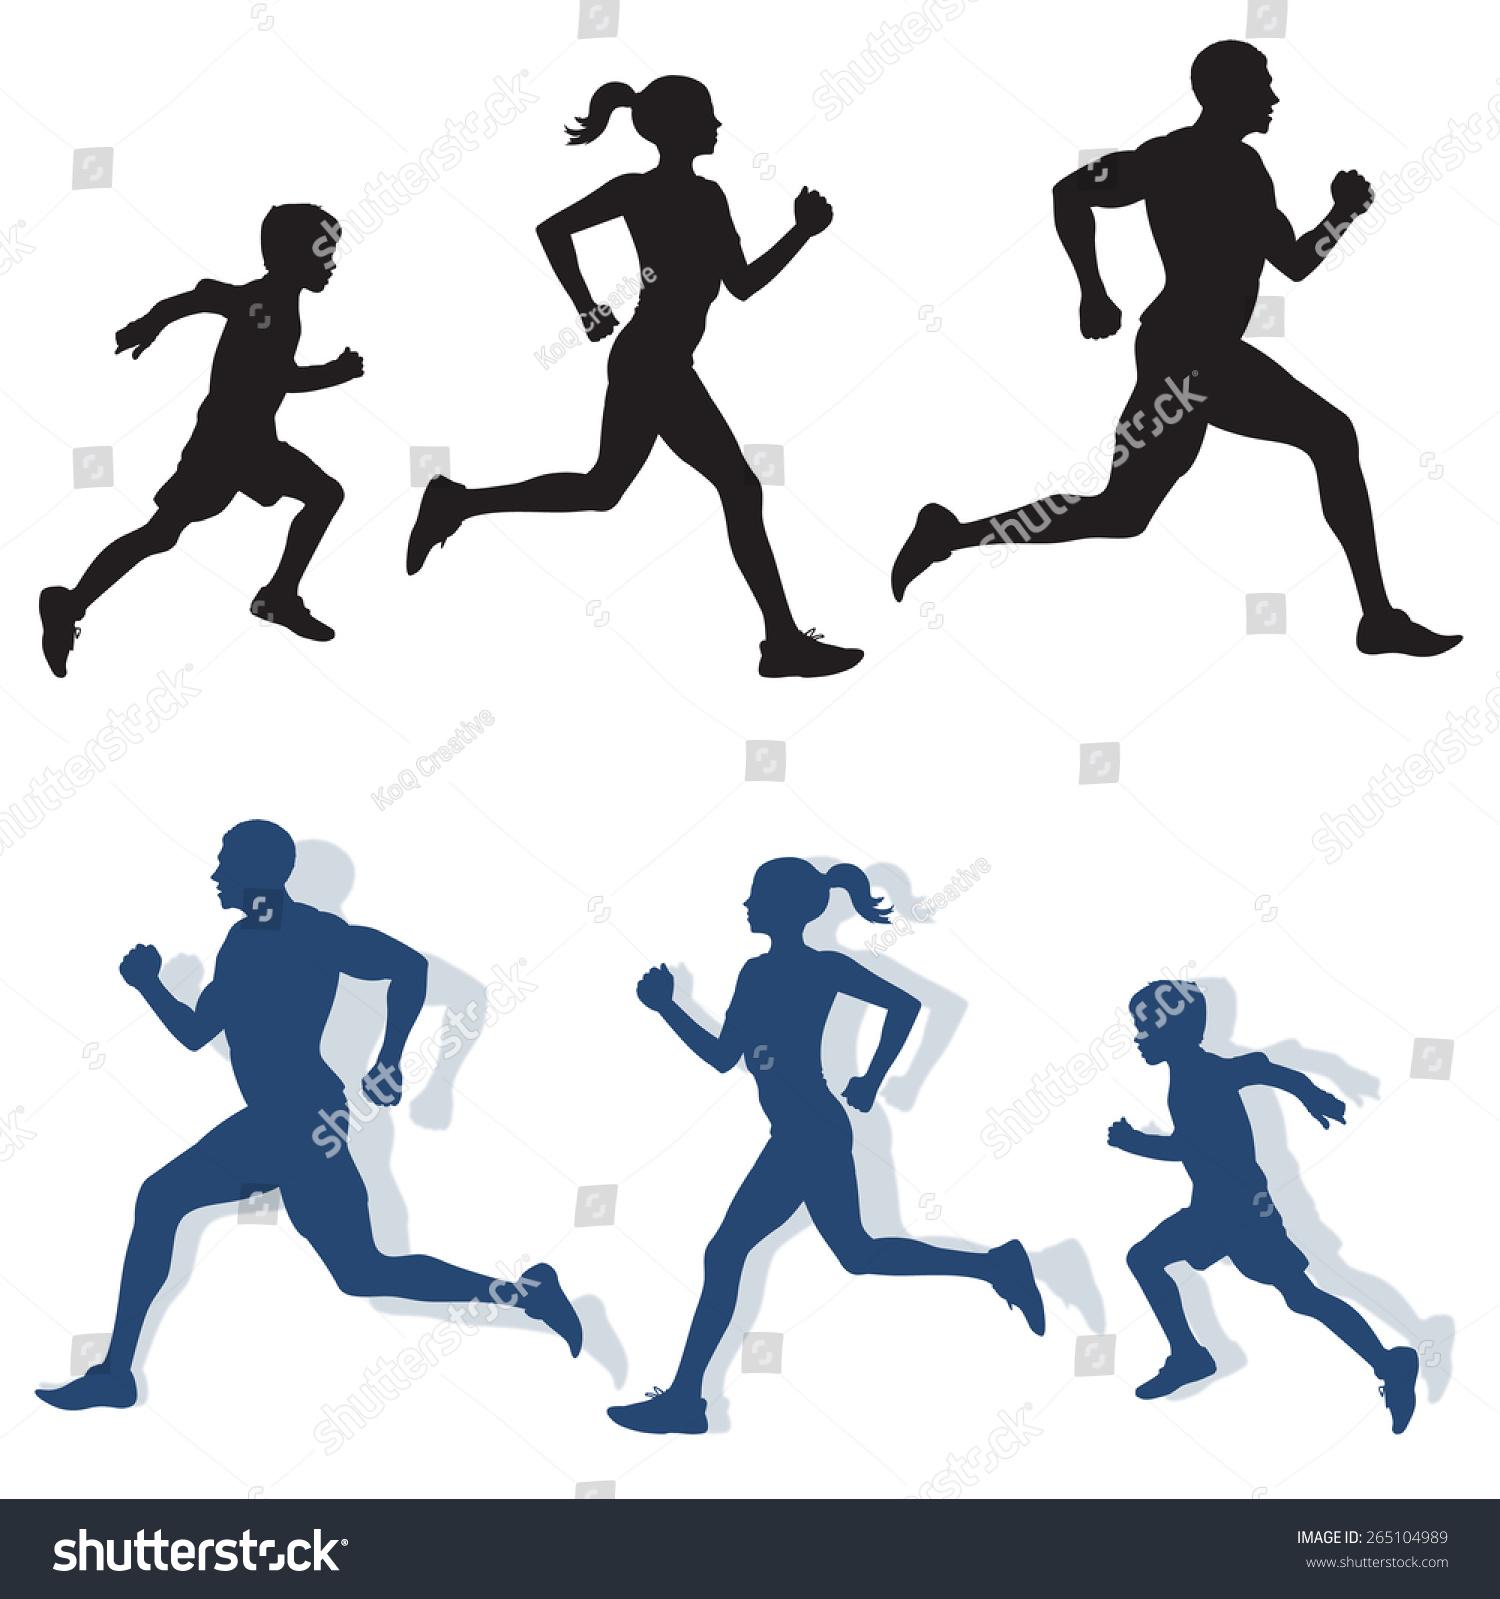 family running clipart - photo #42